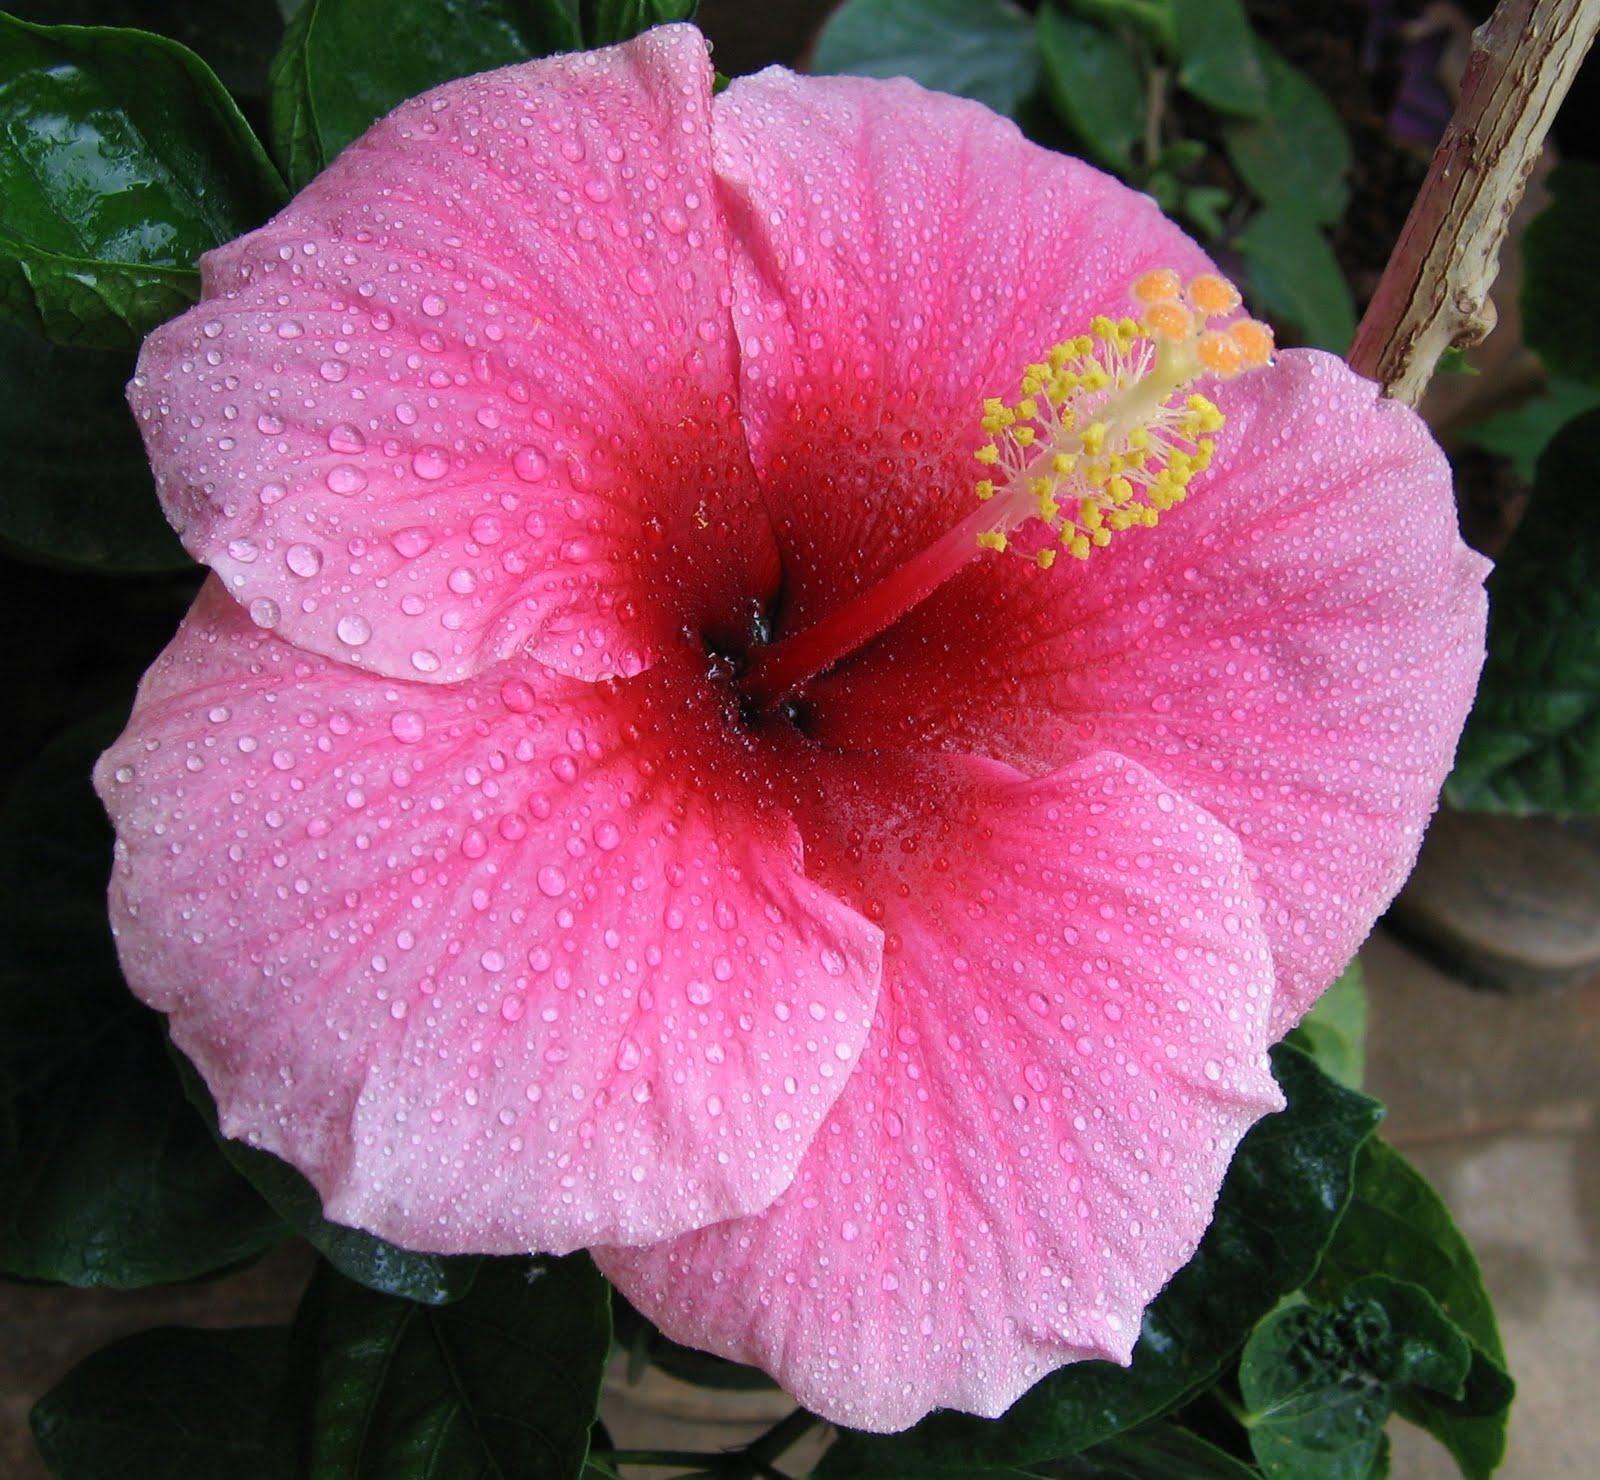 Bunga raya, sebenar nya dikenali juga sebagai bunga sepatu dan kembang ...